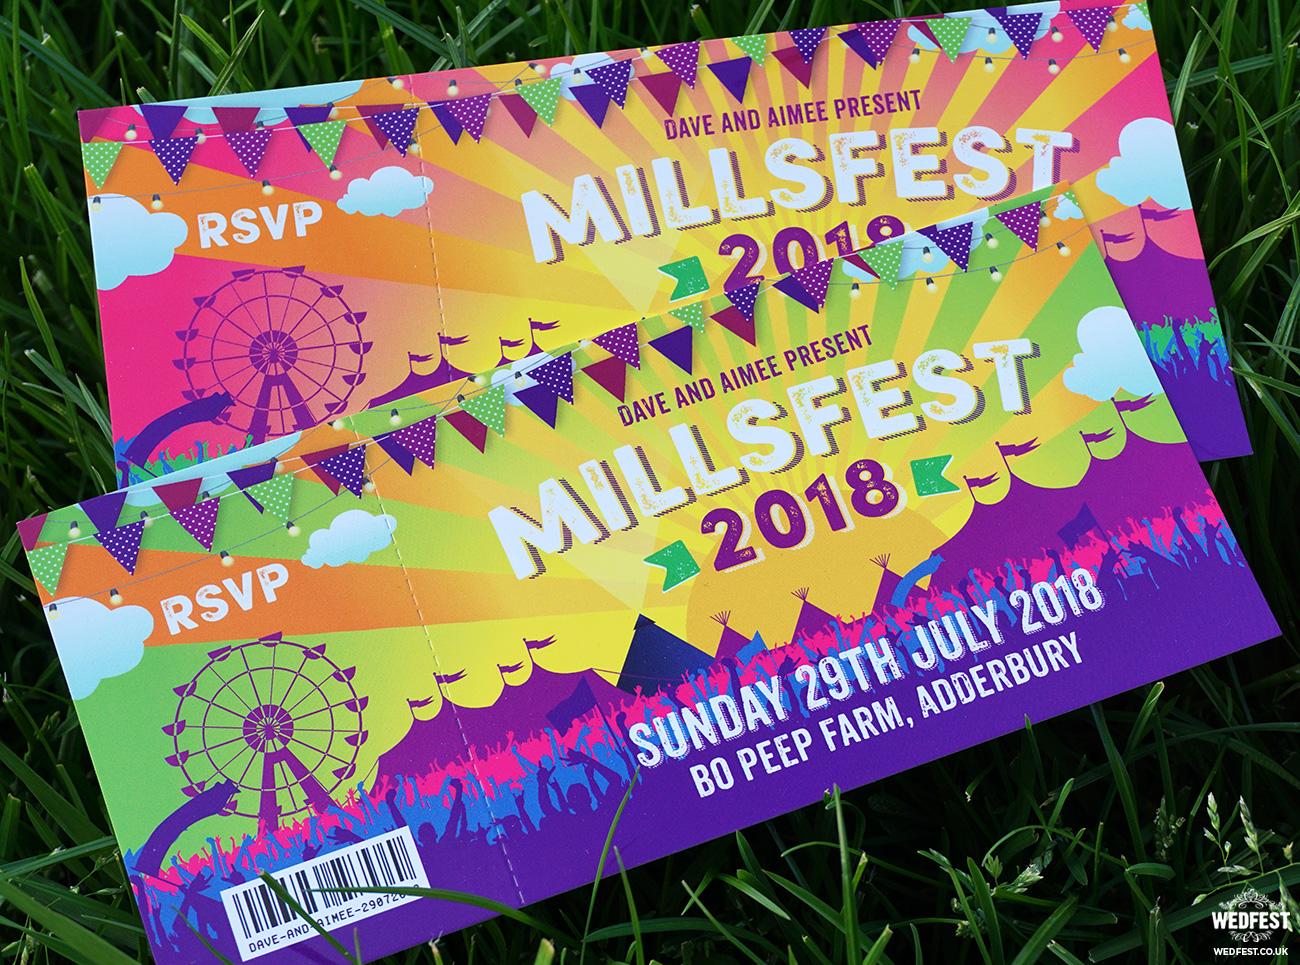 festival ticket wedding invites bo peep farm